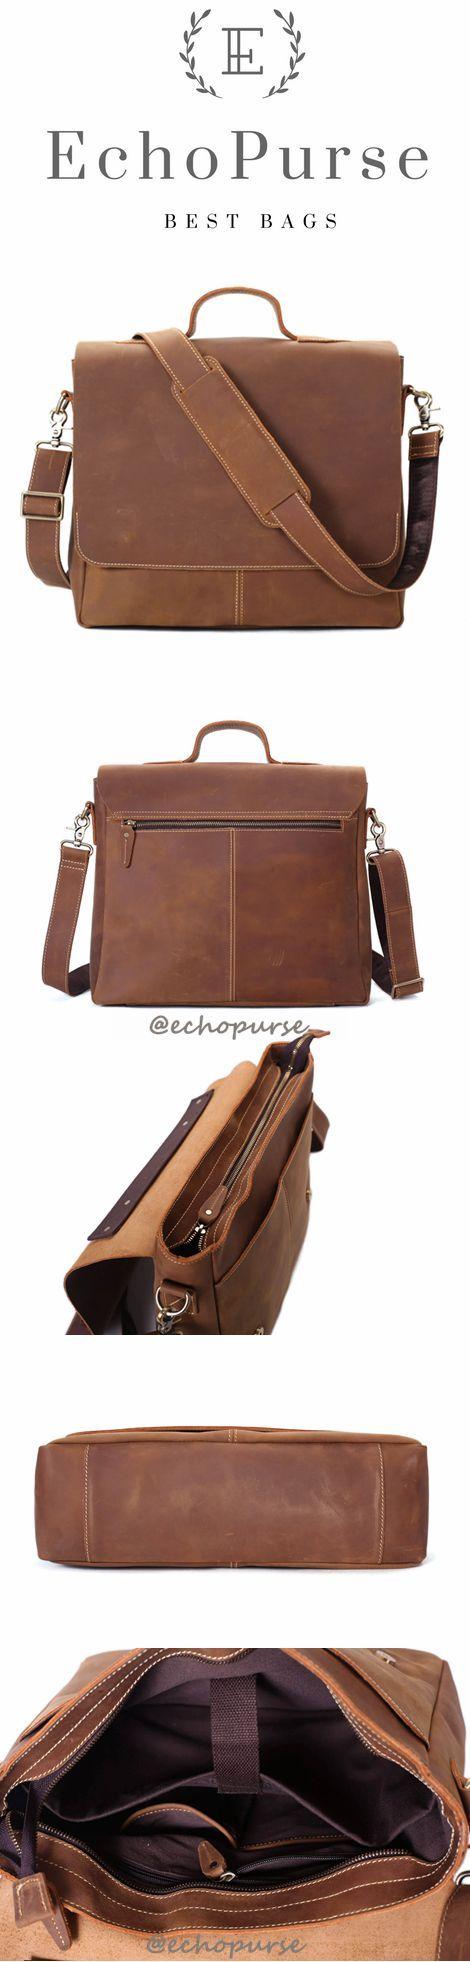 Vintage Brown Leather Messenger Bags, Leather Briefcase, Shoulder Bags For Men 7108